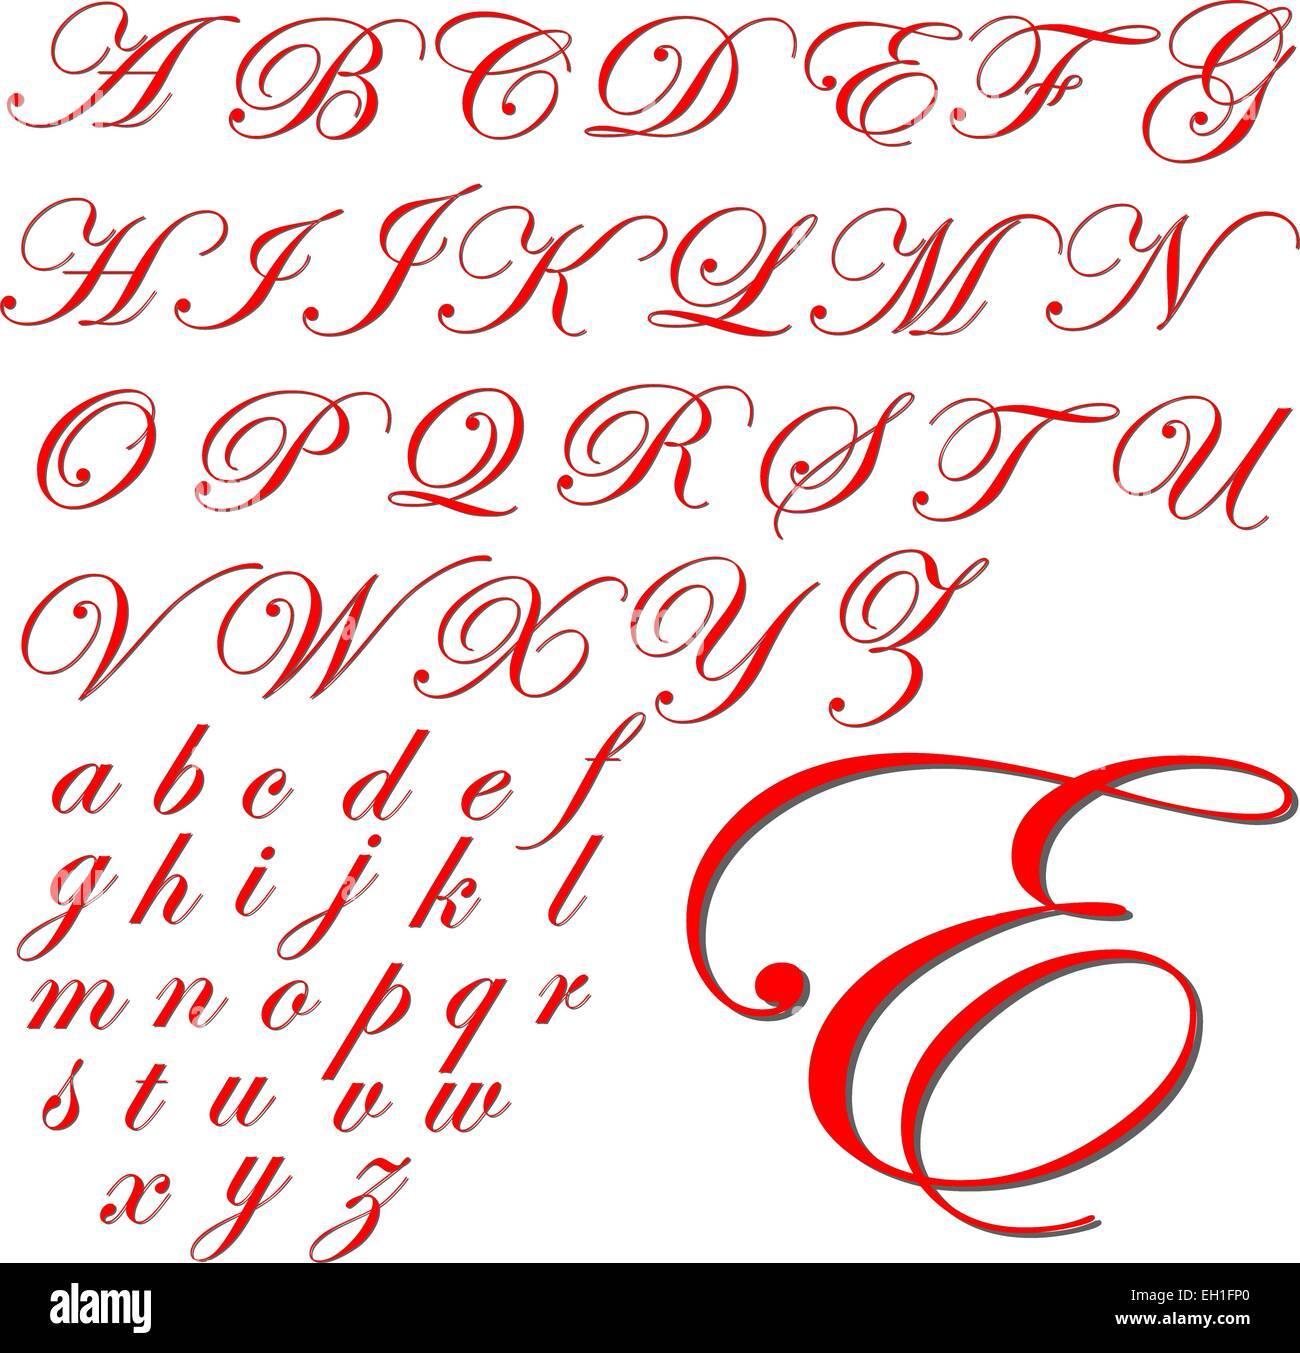 Alphabet Design Stock Photos & Alphabet Design Stock Images